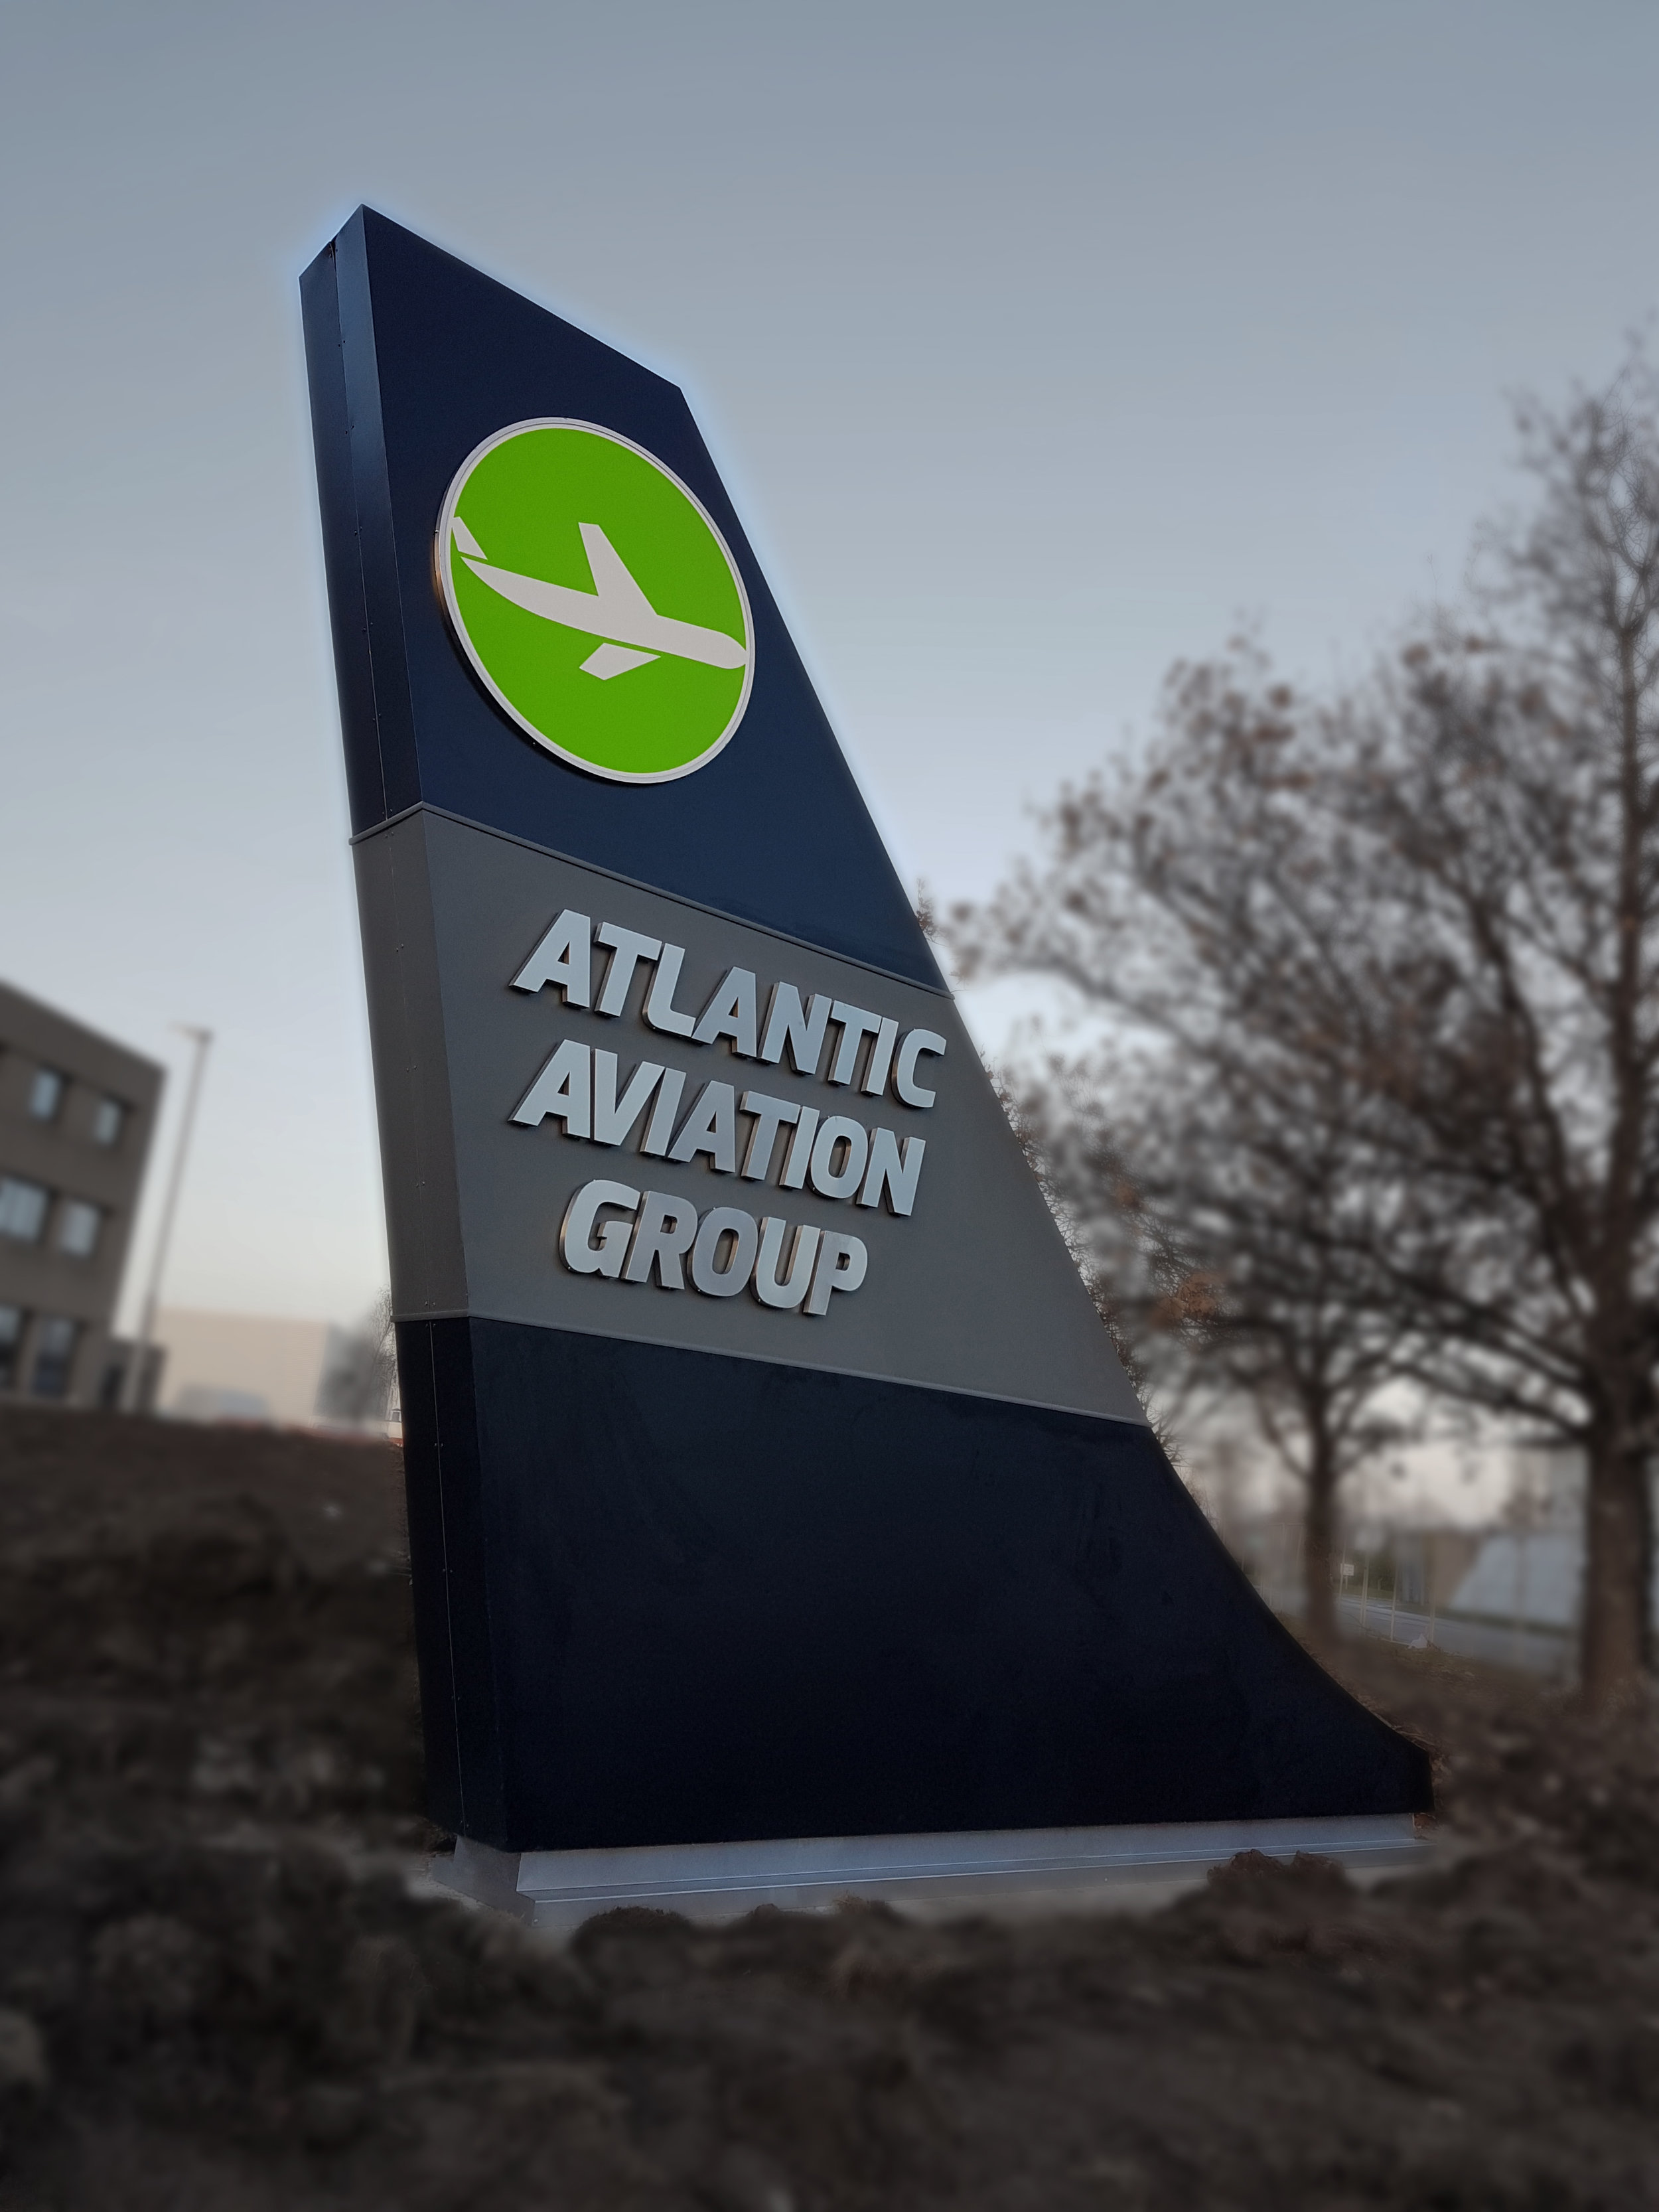 Atlantic Aviation Group, Shannon, Co. Clare